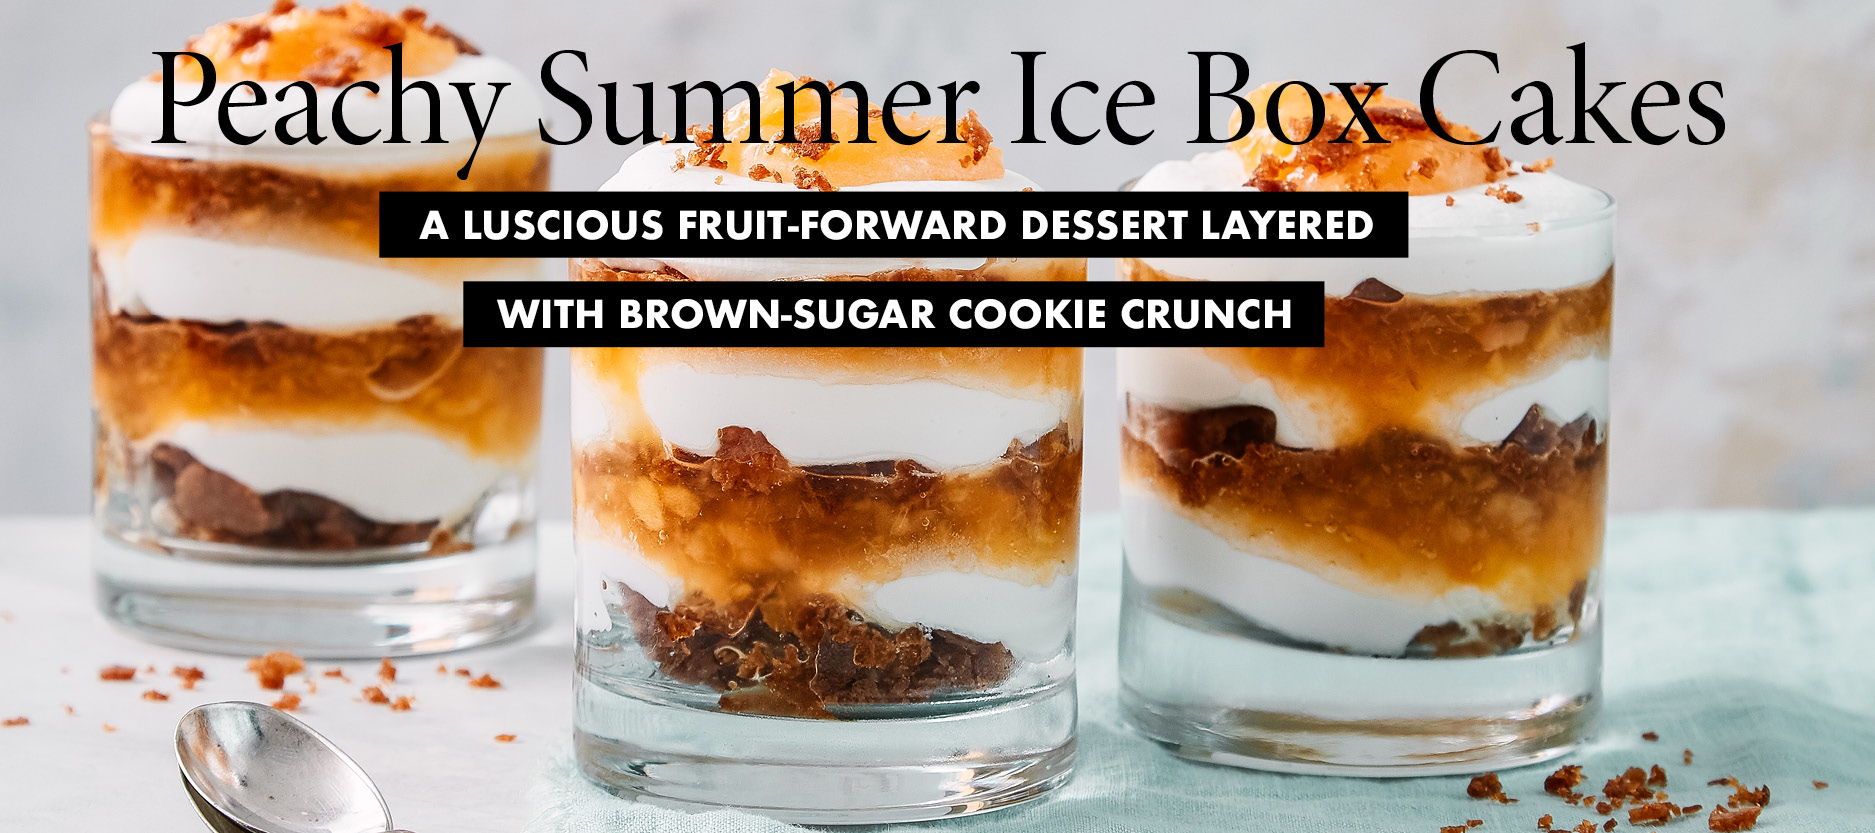 Peachy Summer Ice Box Cakes